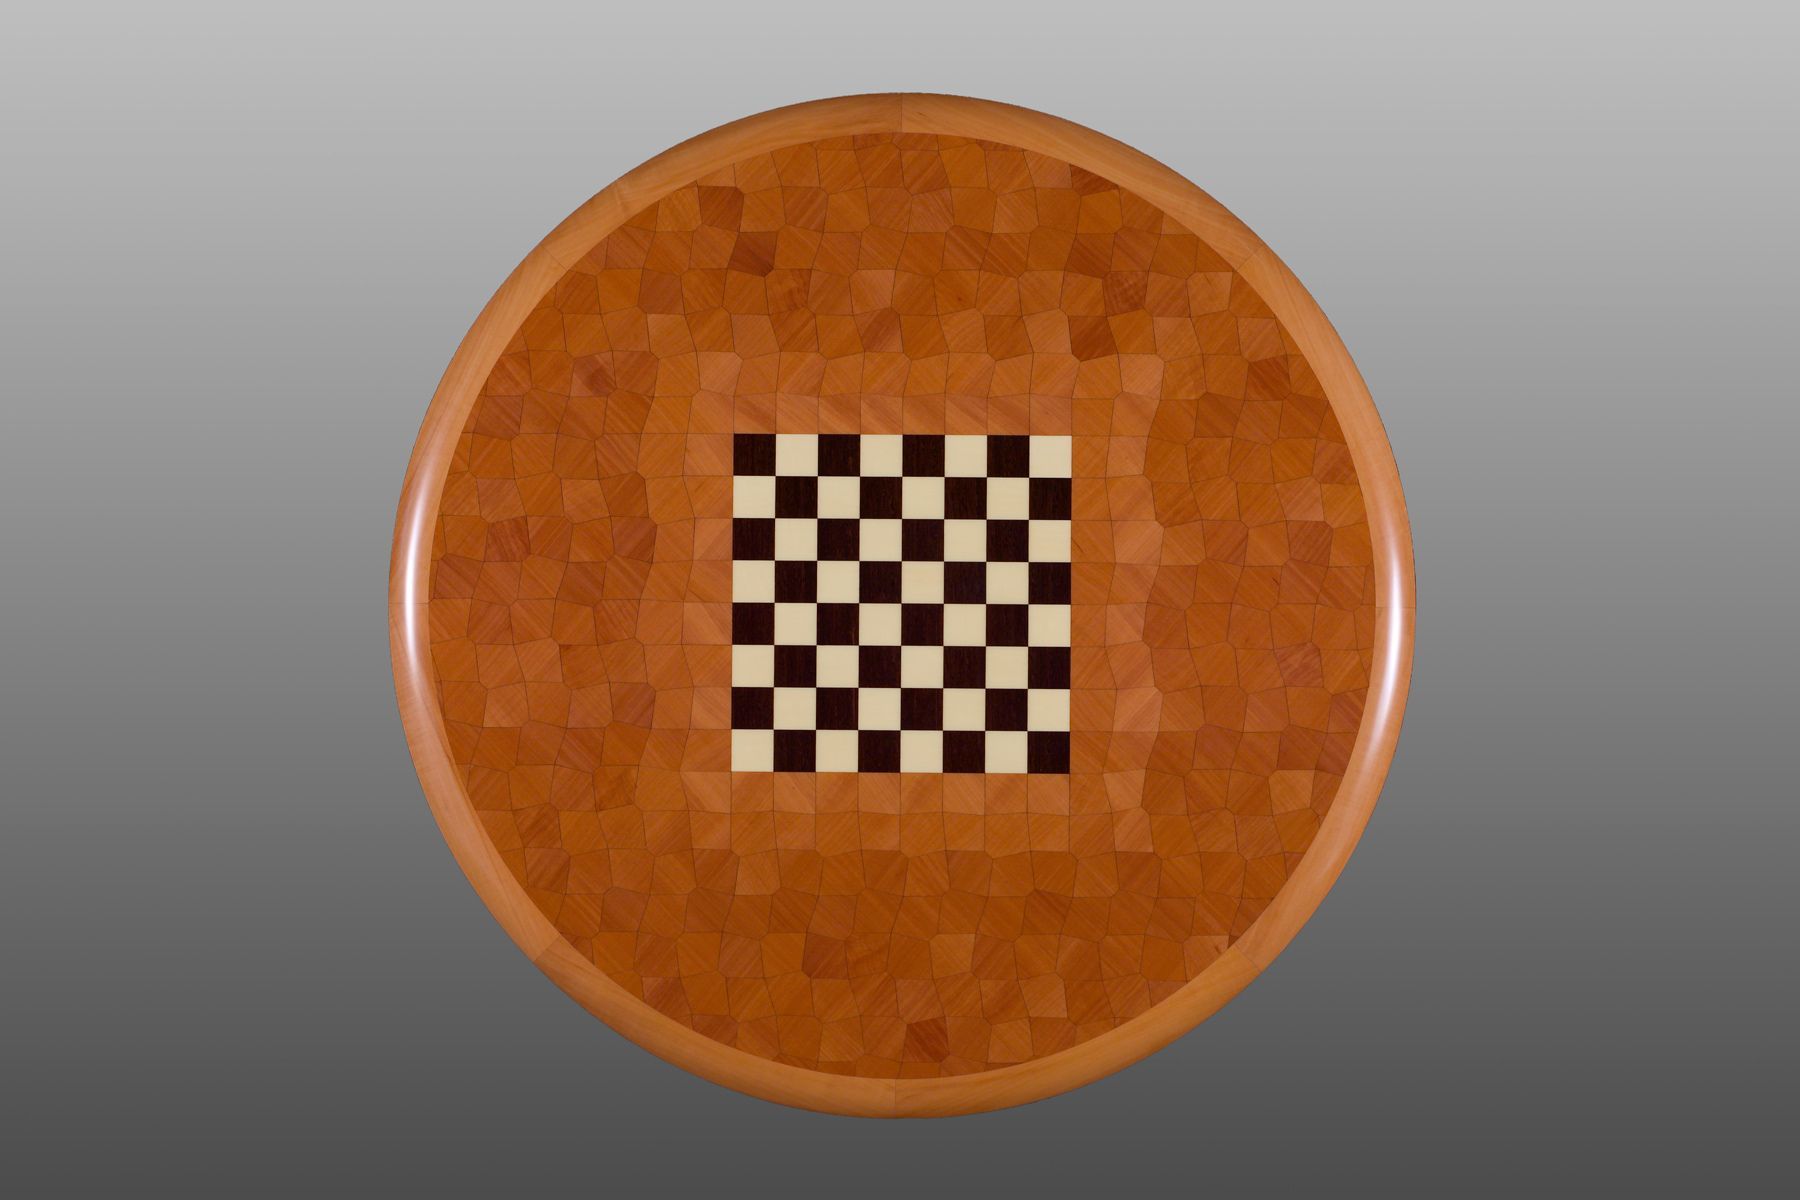 1aaron_levine_contemporary_modern_studio_furniture_maker_wood_woodworker_art_artist_northwest_parquetry_tessellation_game_chess_table_chessellation_pear_detail3.jpg